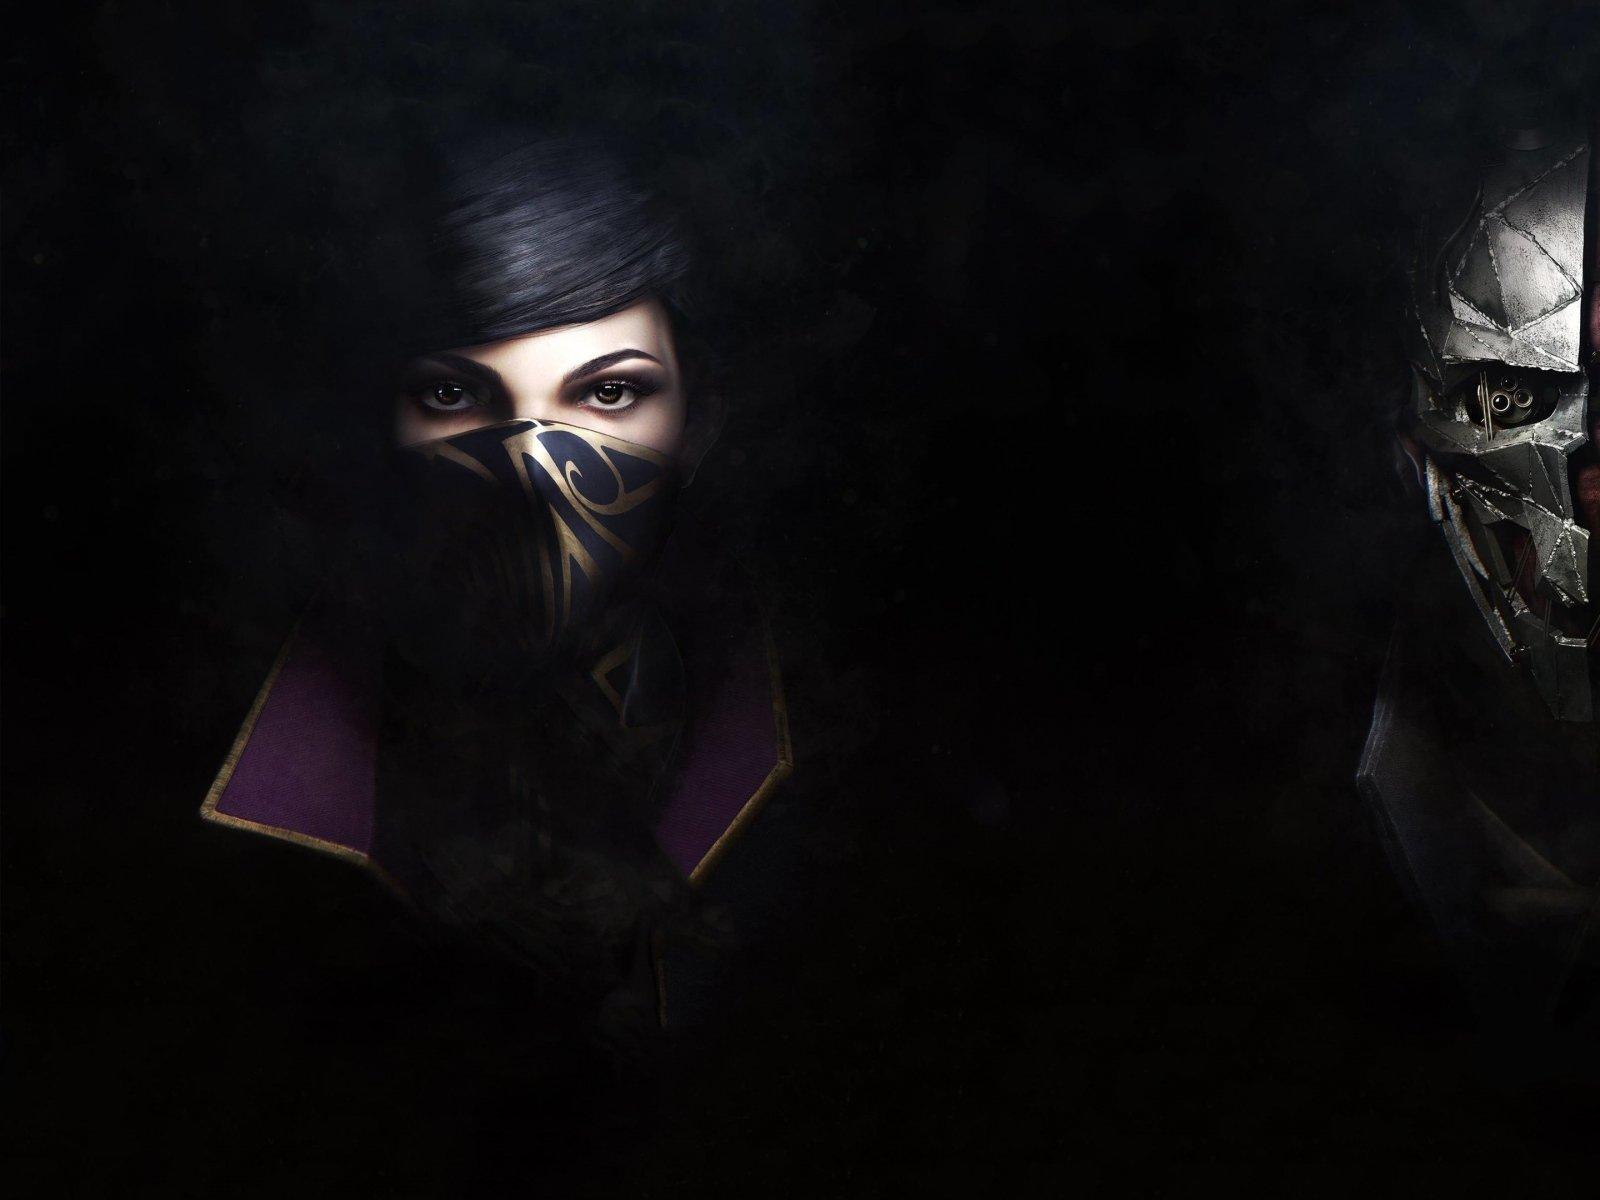 Dishonored 2, Emily kaldwin, Corvo attano 1600×1200 HD Background